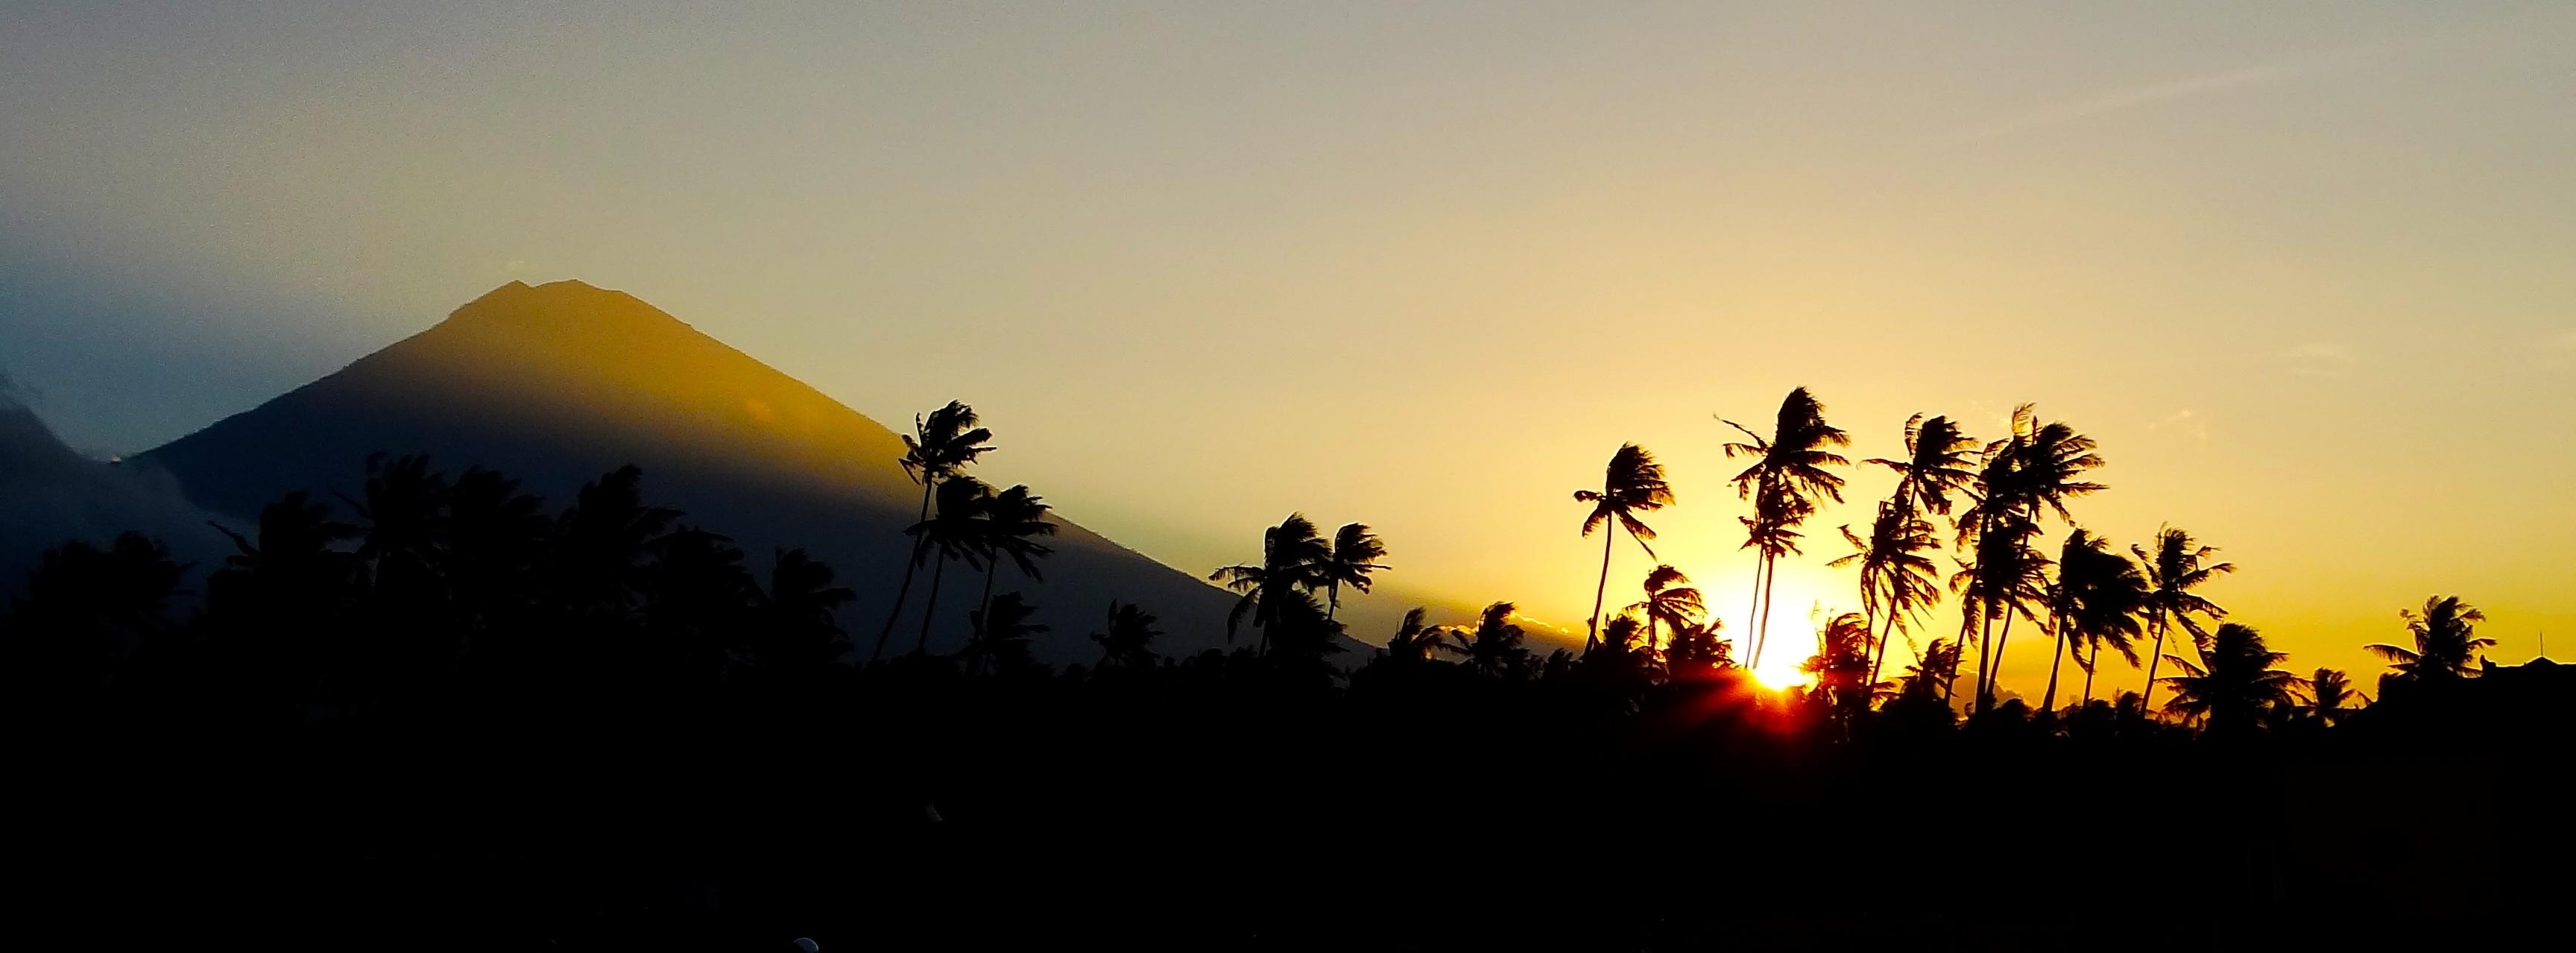 Amed Sunset, Bali